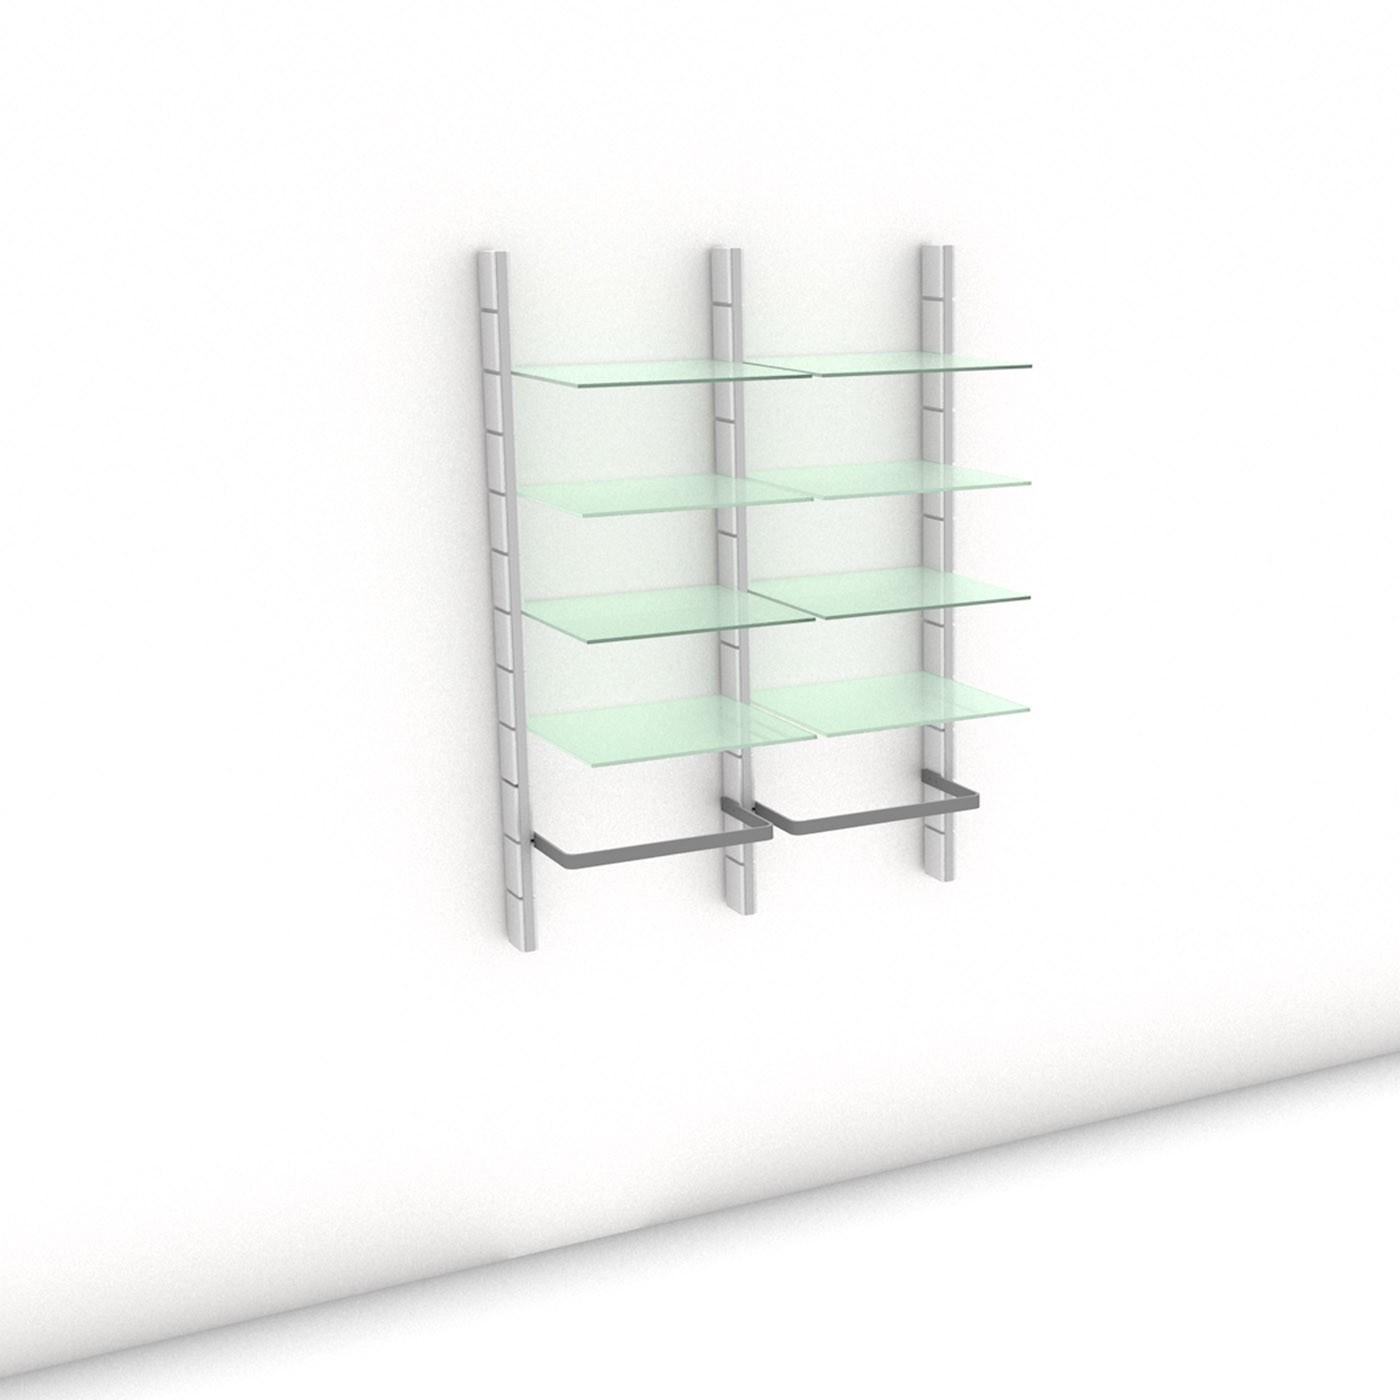 Begehbarer Kleiderschrank - Comfort (L) 104 - Maß: 104 x 143,2 x 45 cm (B x H x T)